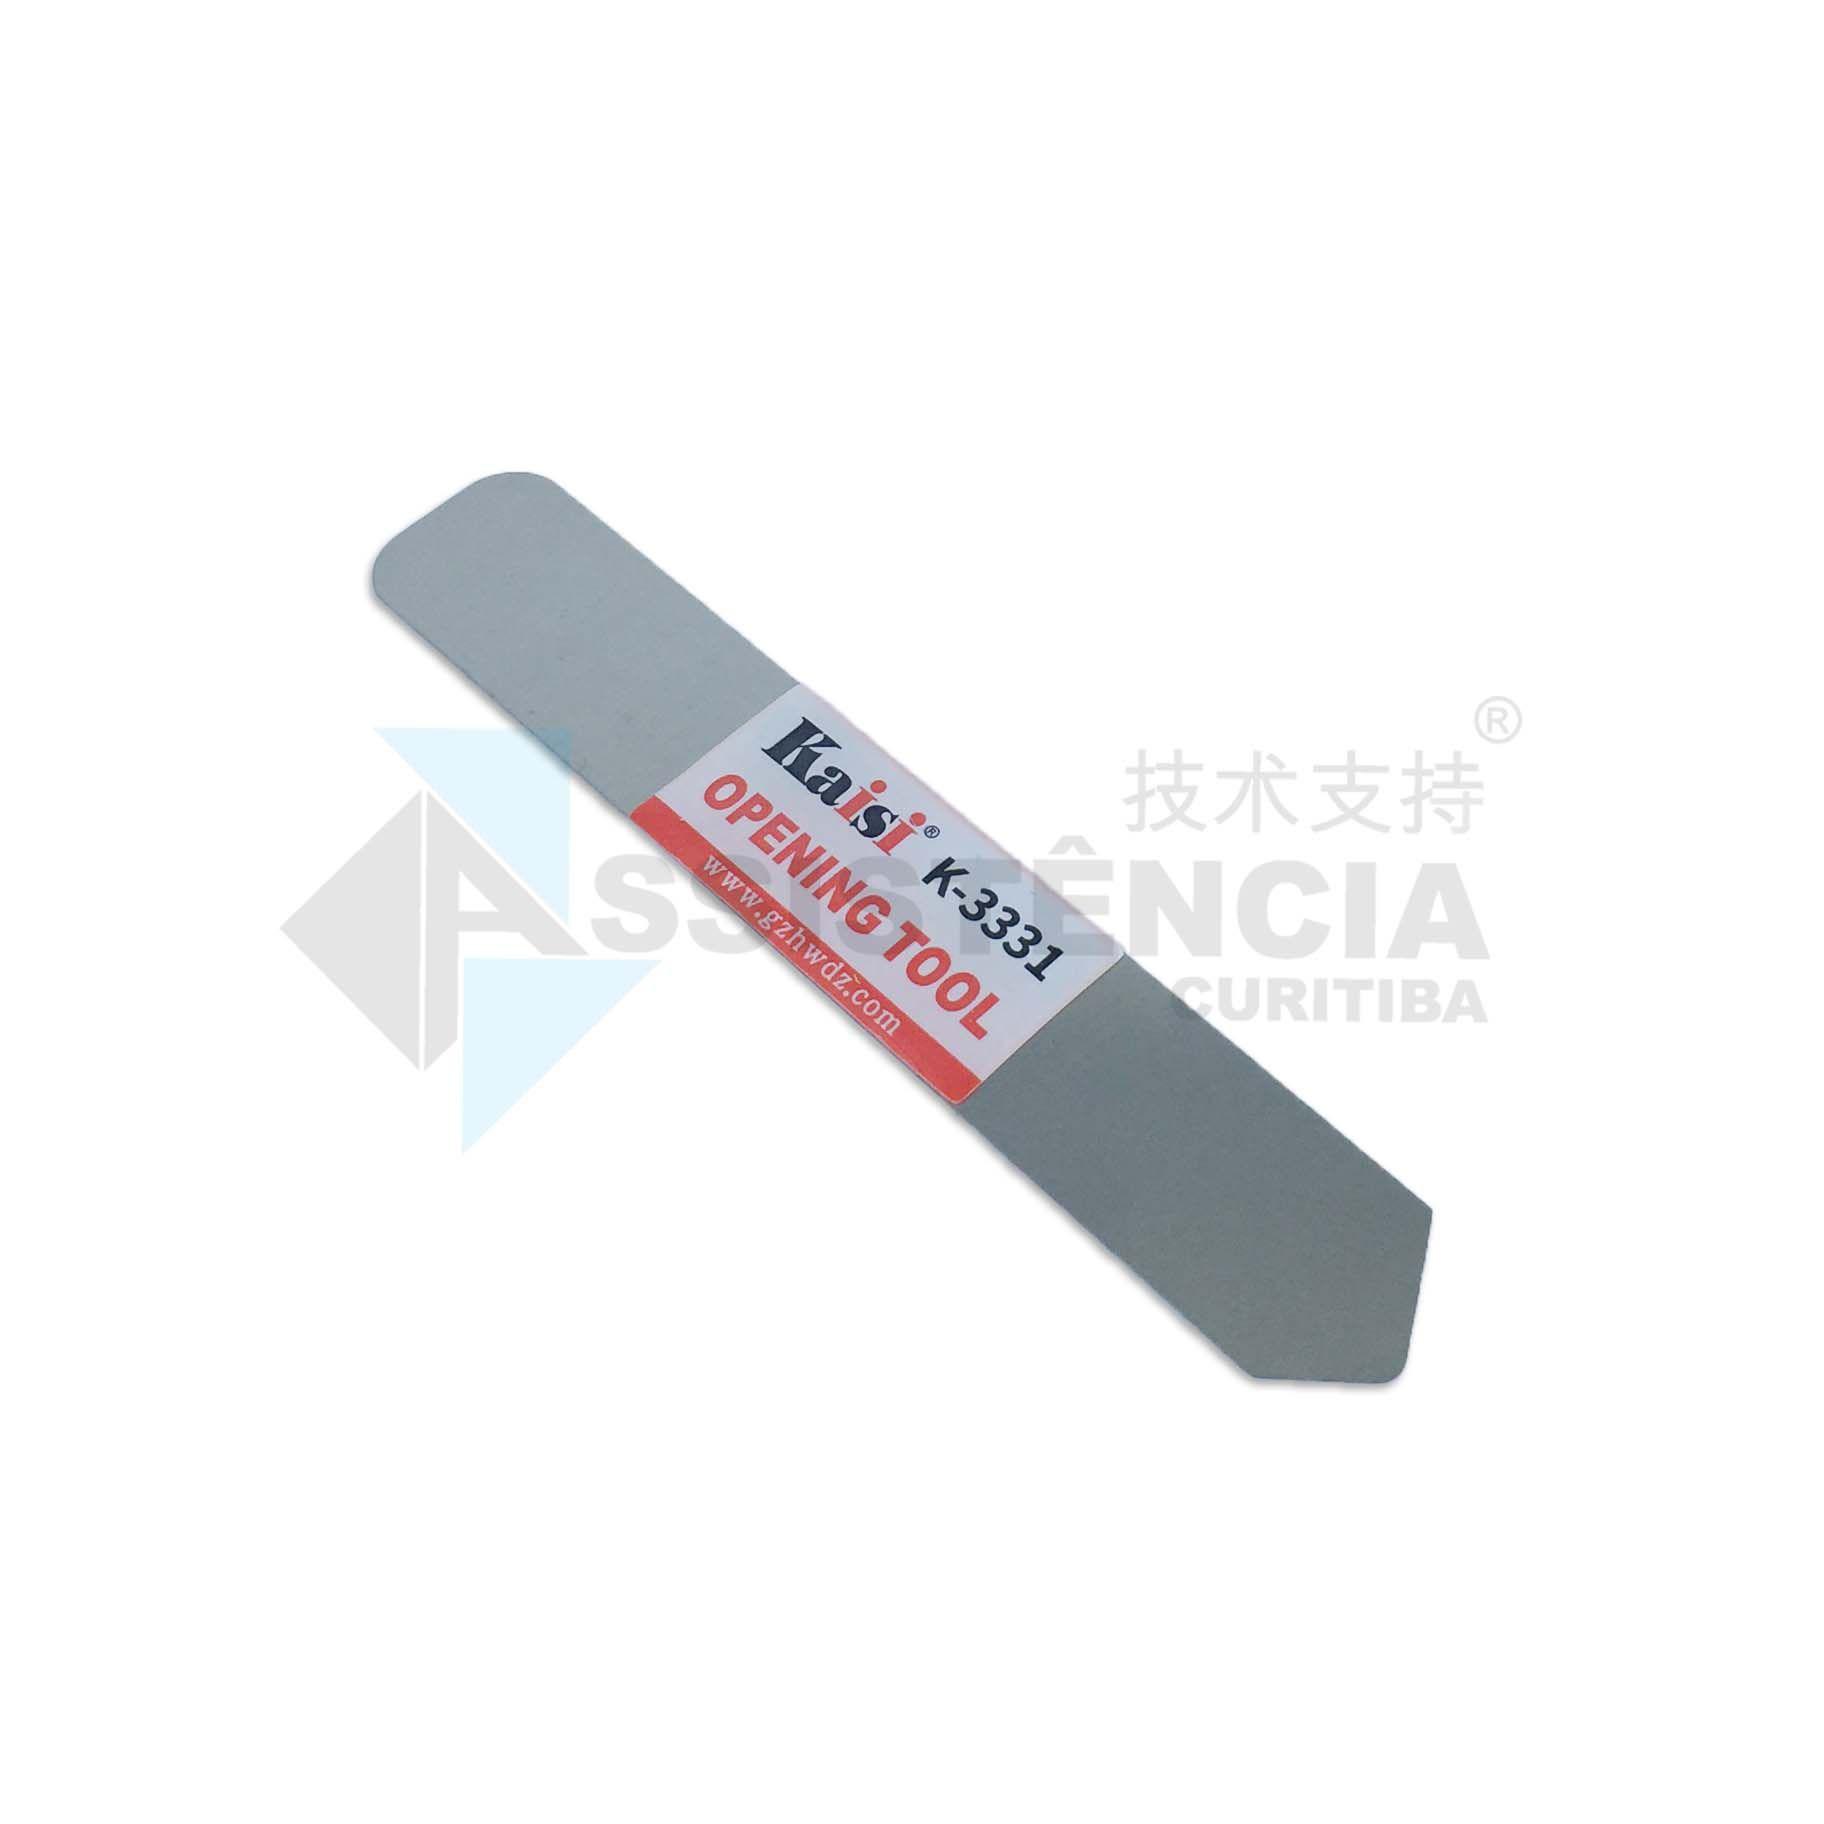 Lamina Espátula De Aço Inox Flexível Kaisi K-3331